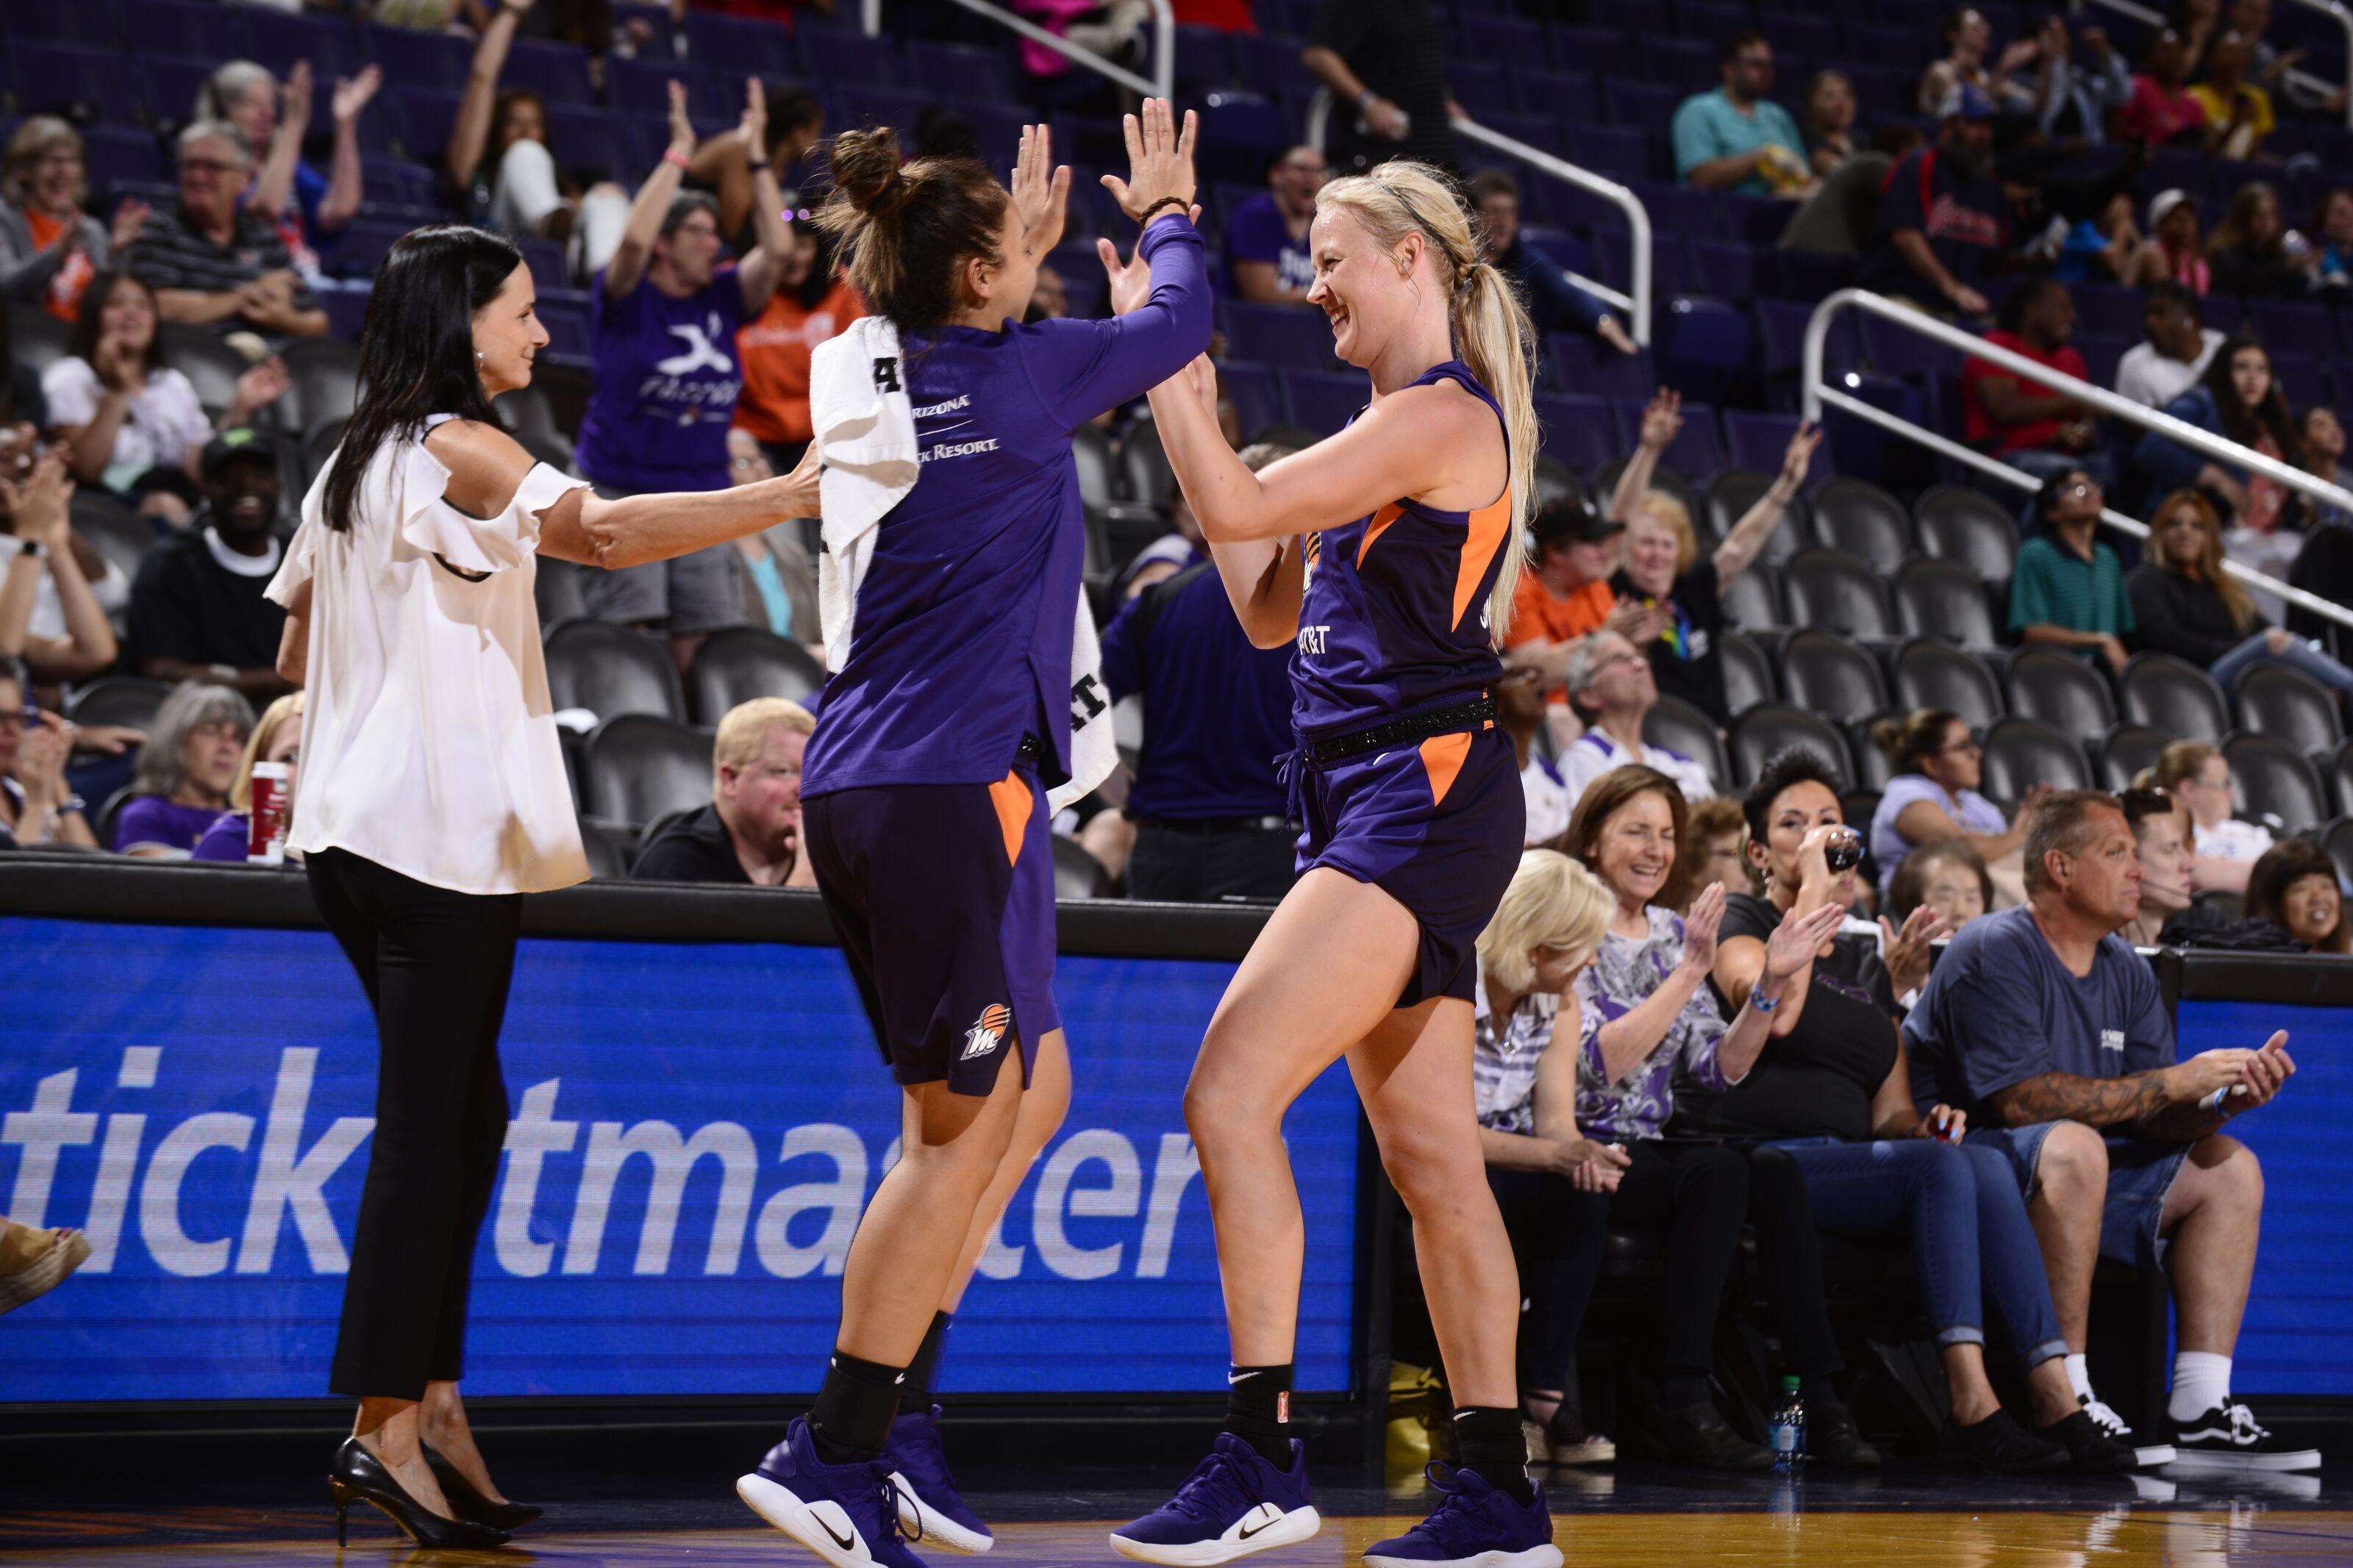 WNBA news: Experienced Mercury ready to mix rookie trio into